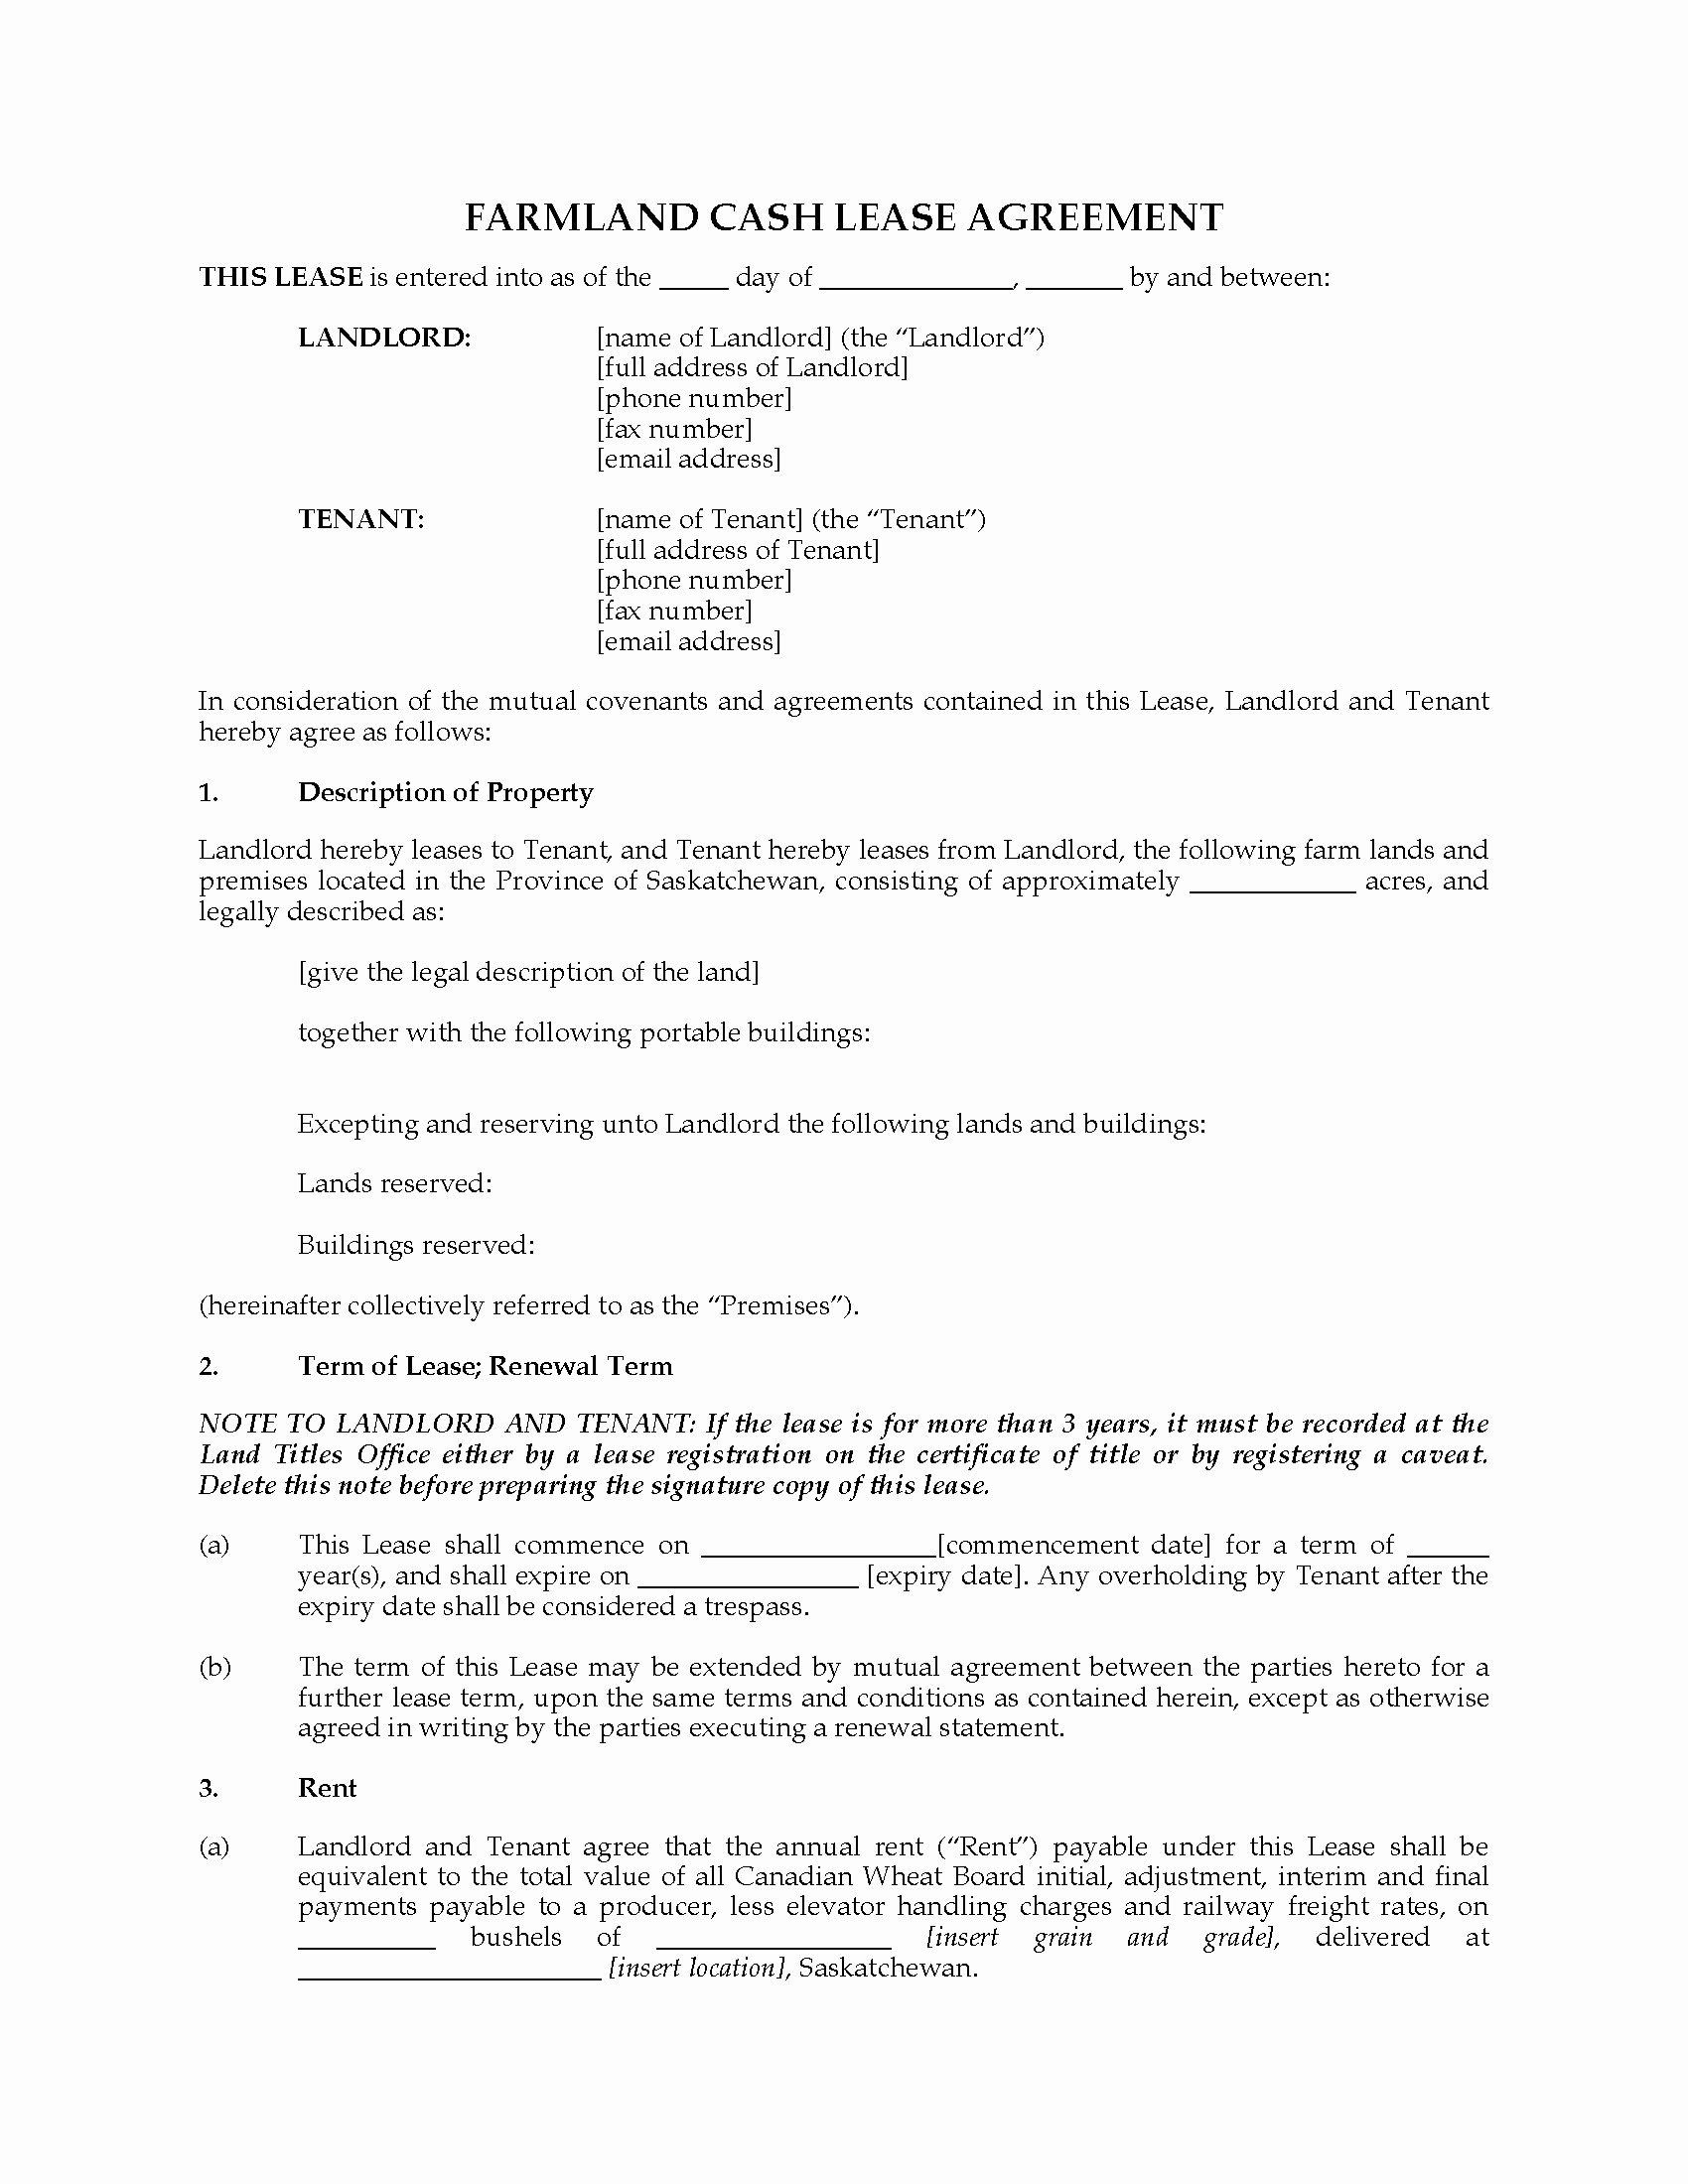 Land Lease Agreement Template Luxury Saskatchewan Farm Land Cash Lease Agreement